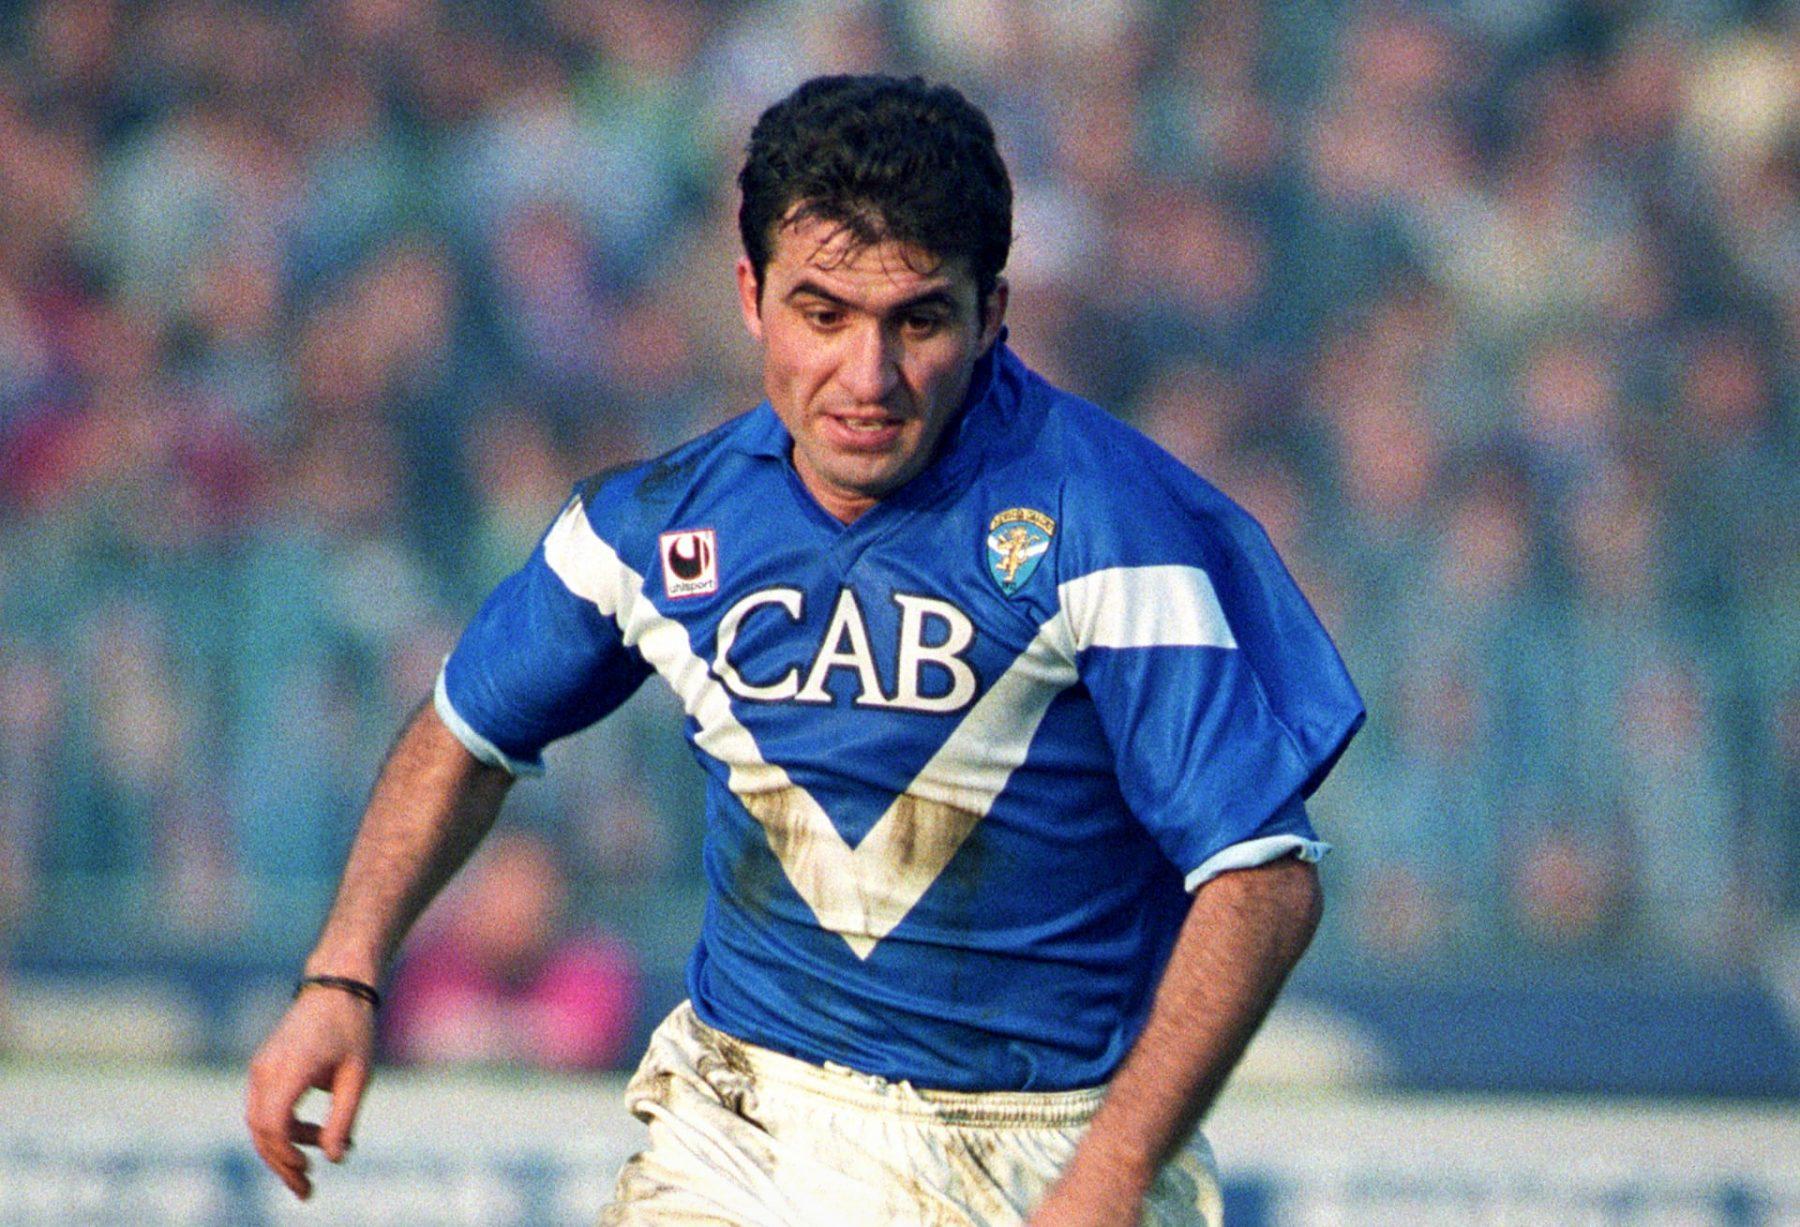 How Gheorghe Hagi Rebuilt His Career In Serie B With Brescia